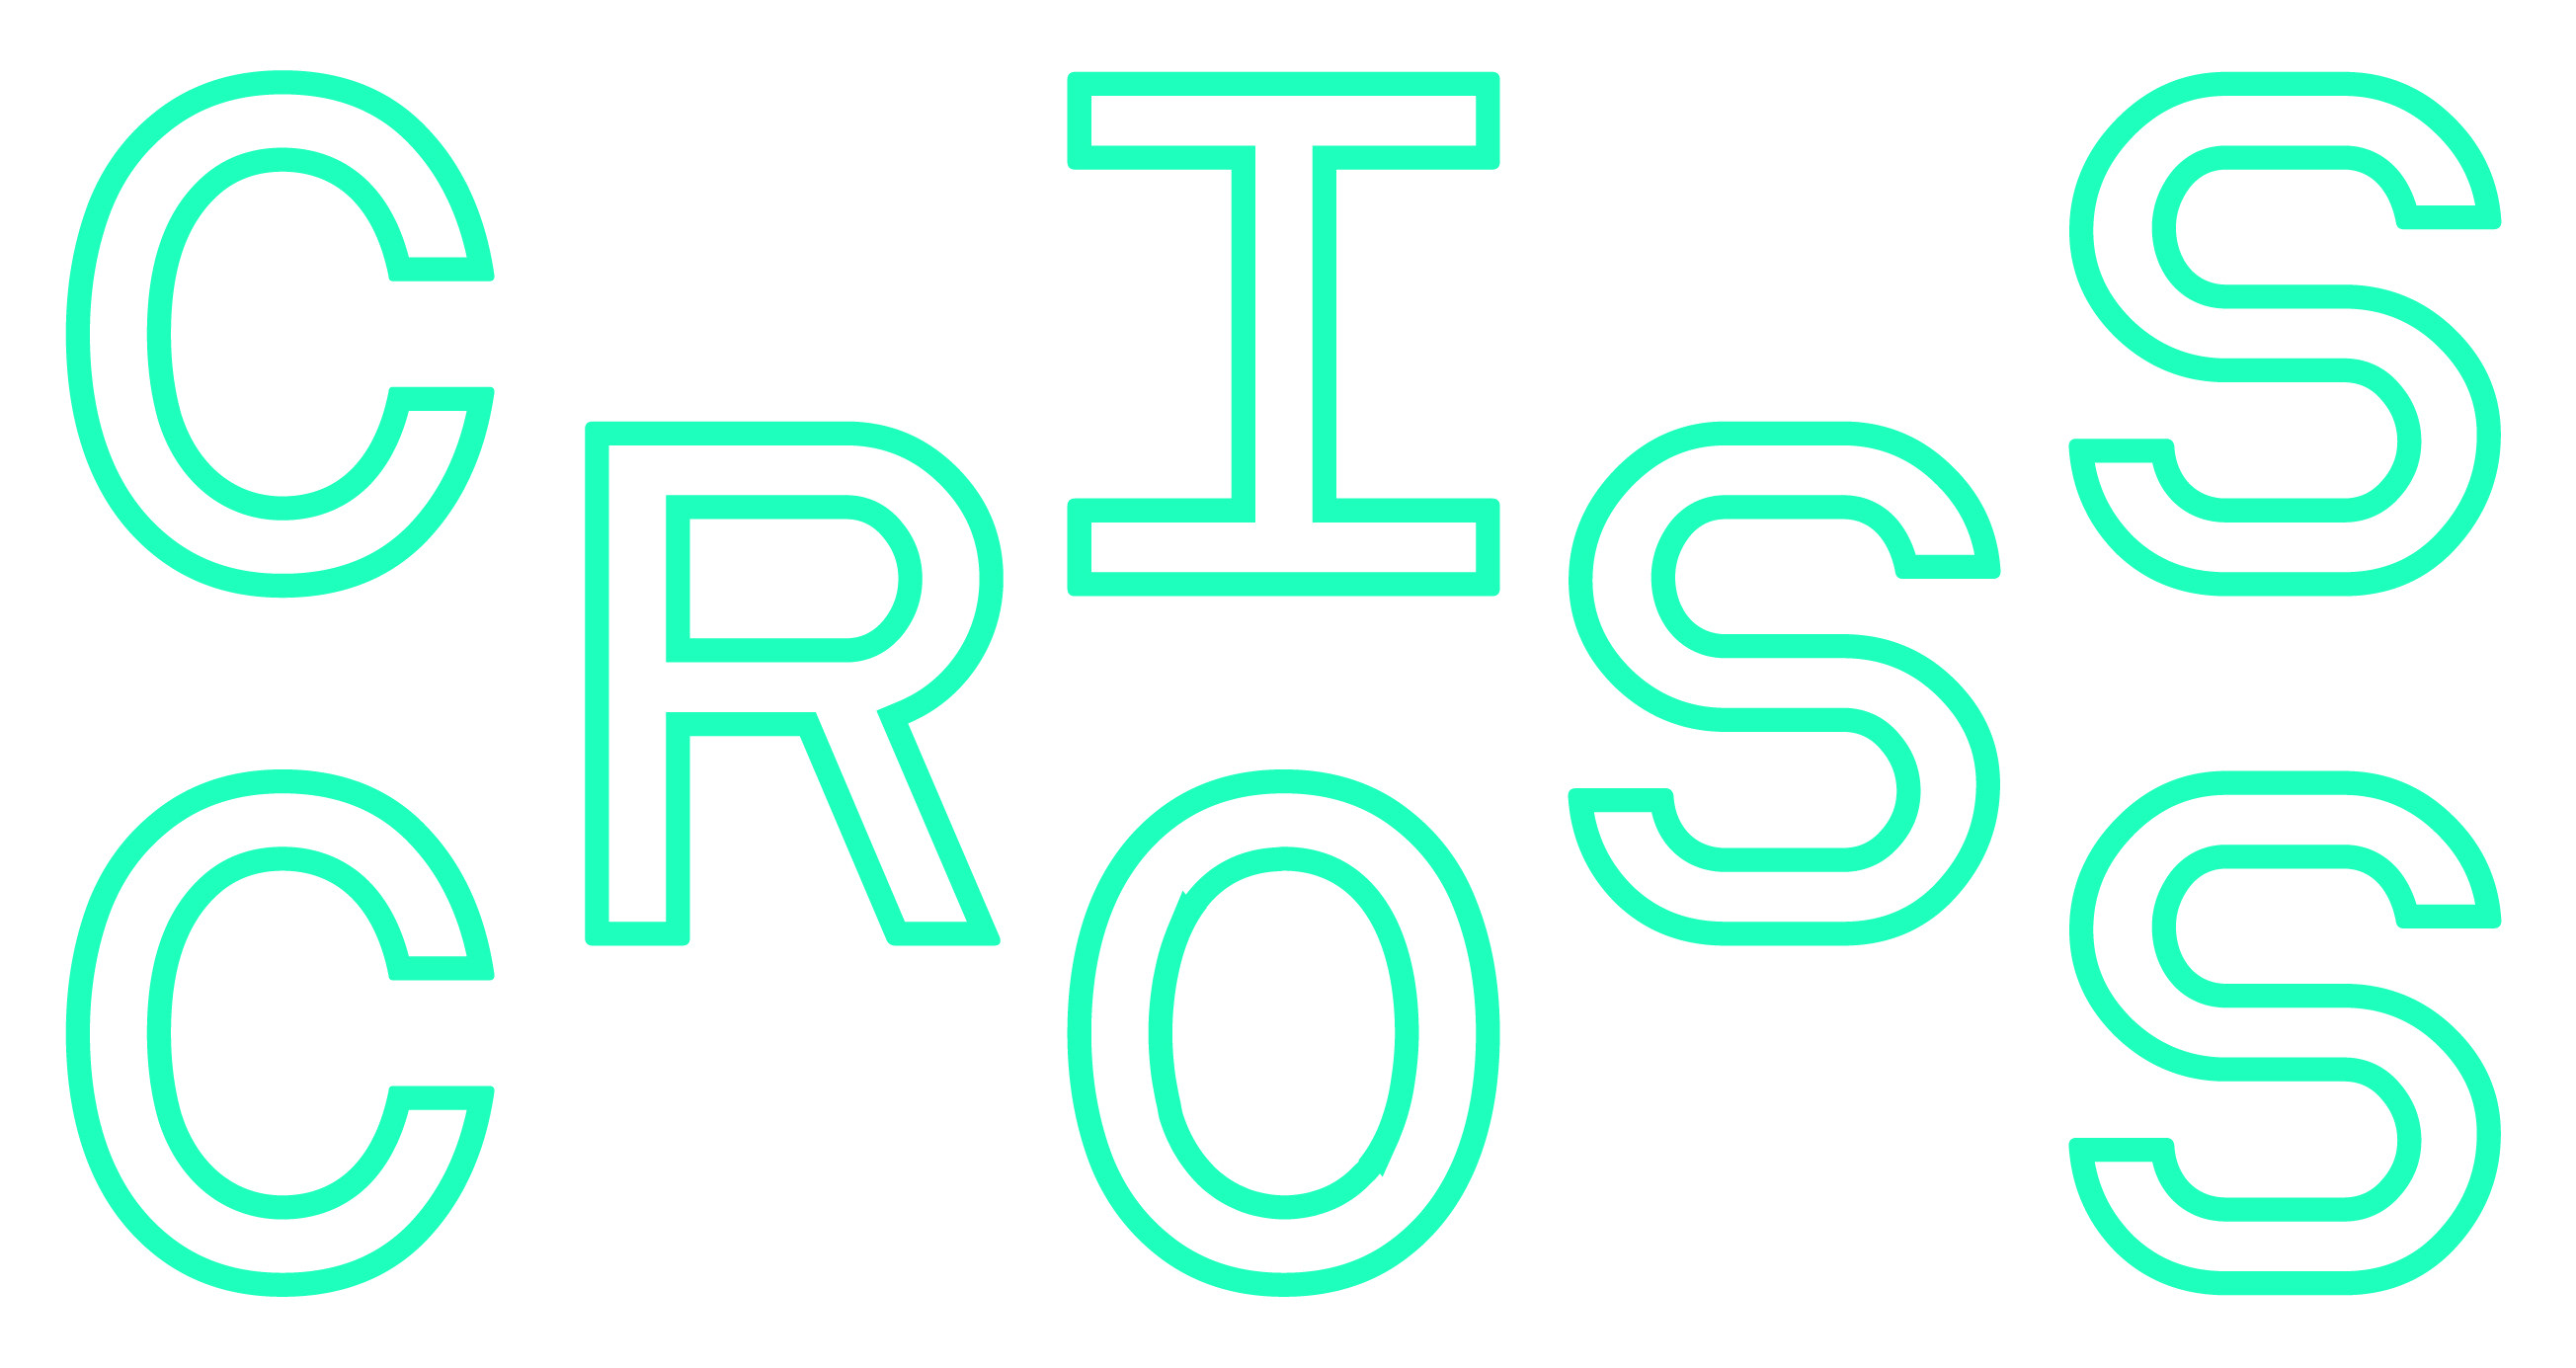 crisscross studio